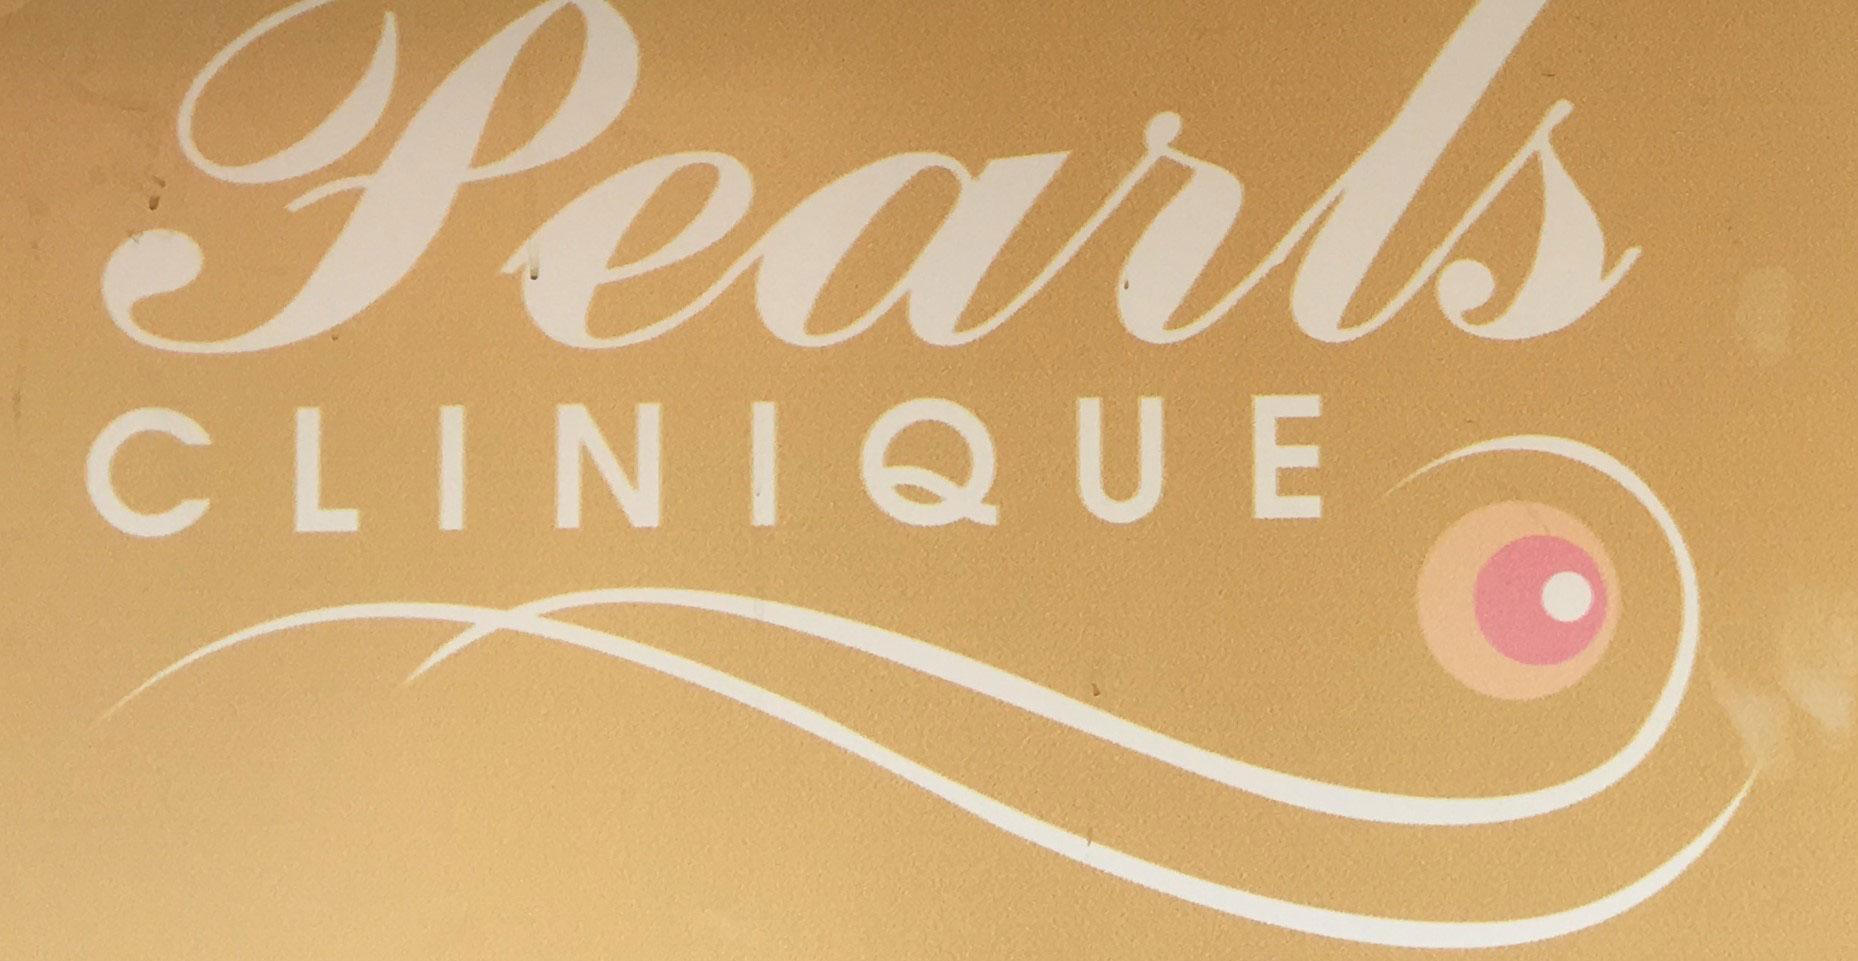 Pearls Clinique